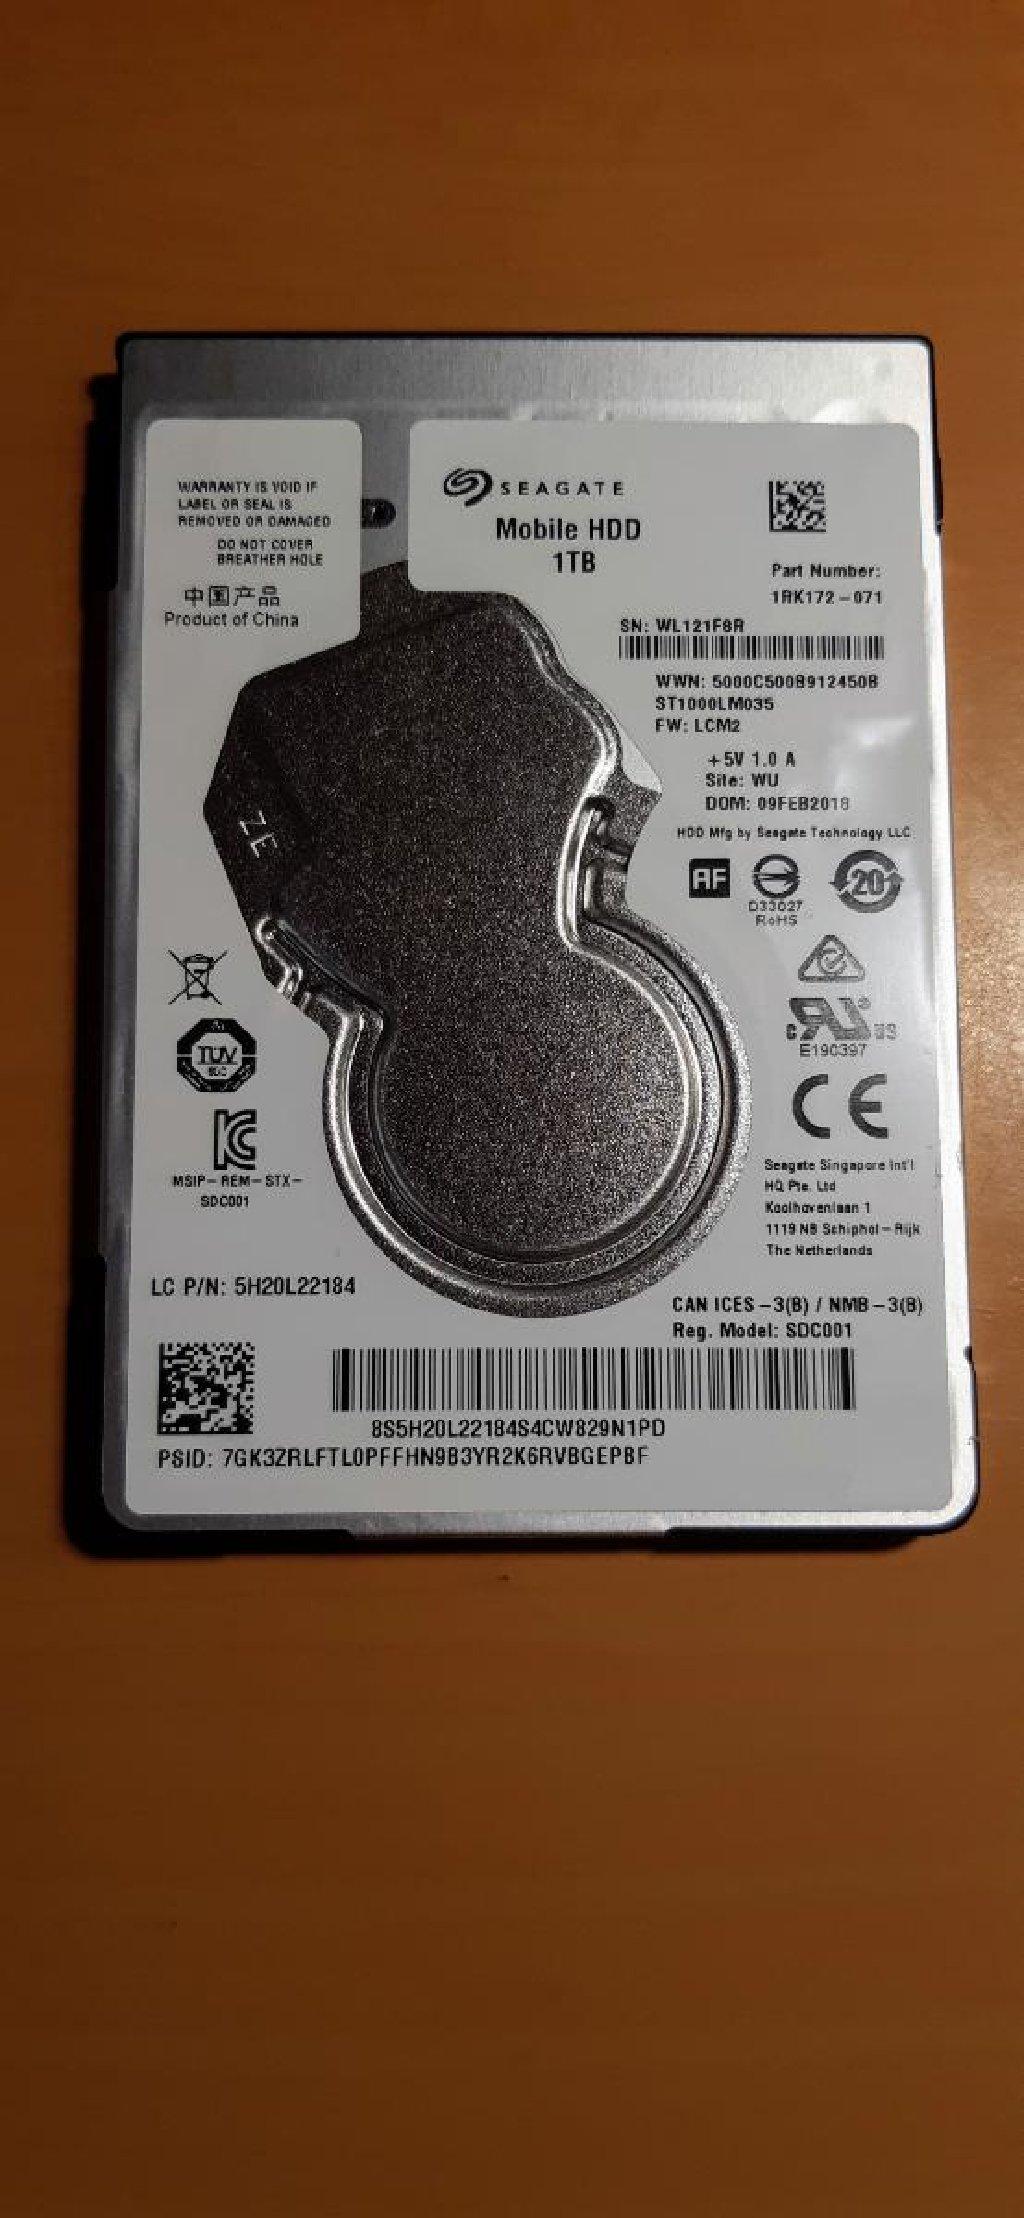 "SEAGATE Mobile HDD 1TB (2.5"")"